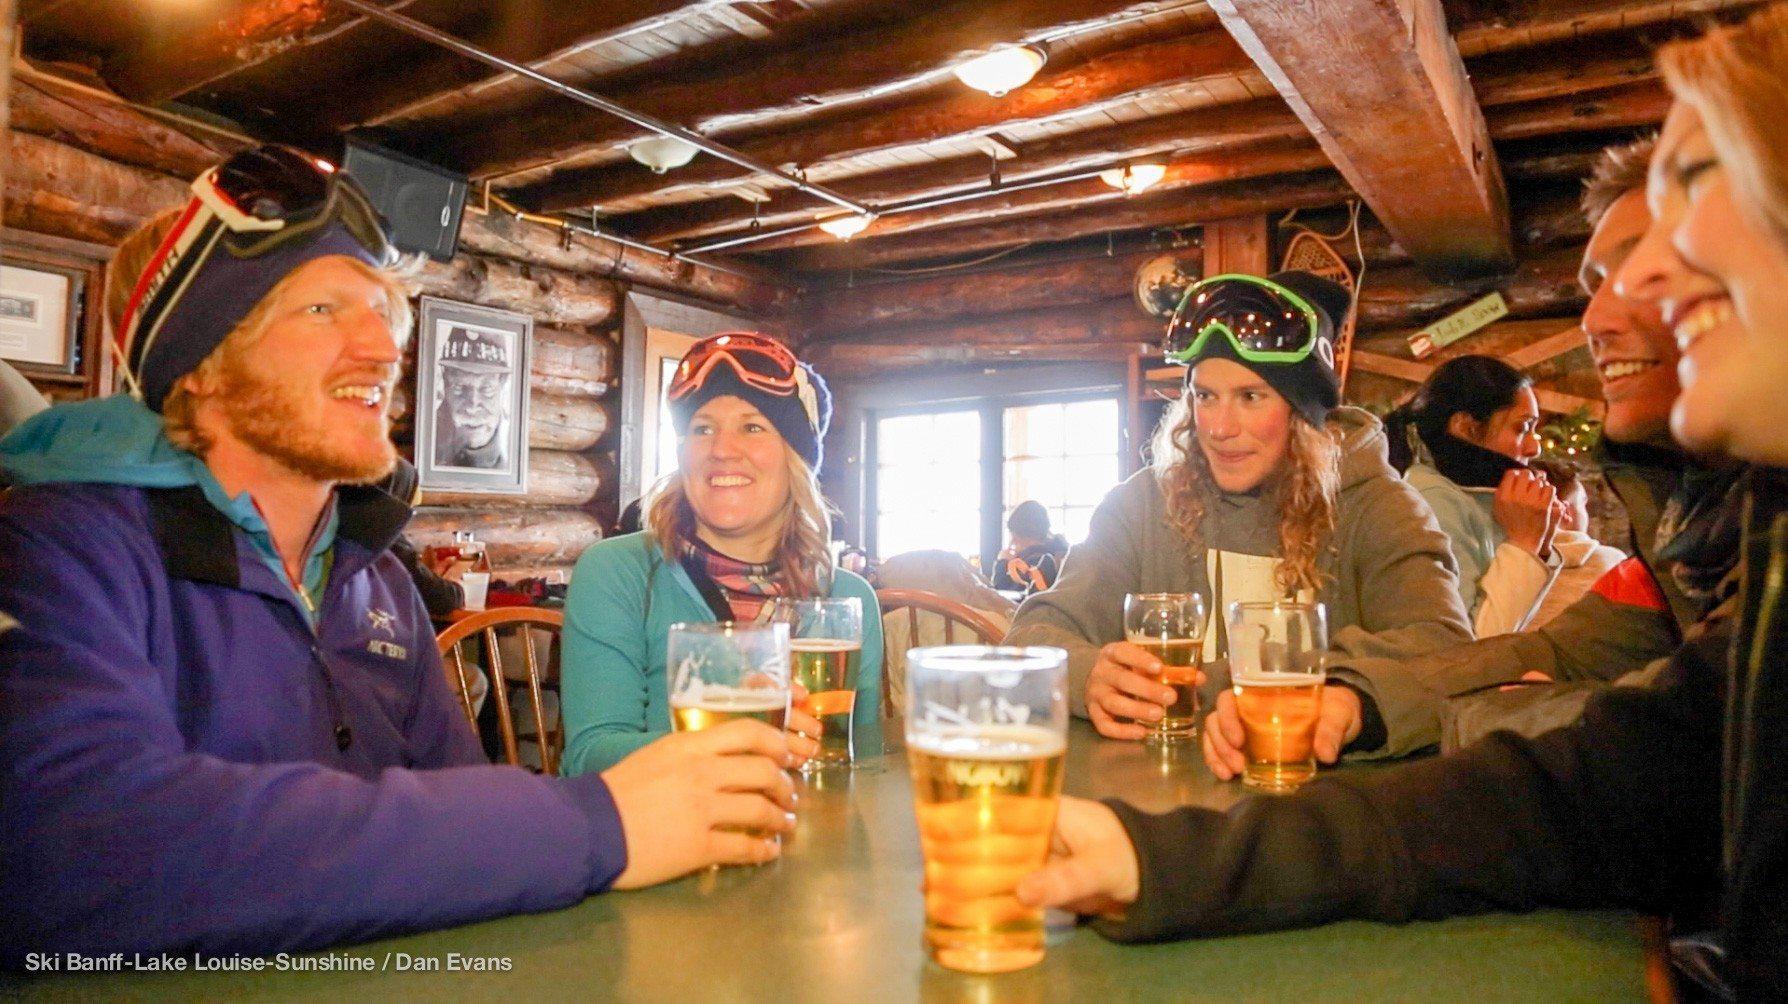 Apres Ski at Banff Lake Louise Sunshine